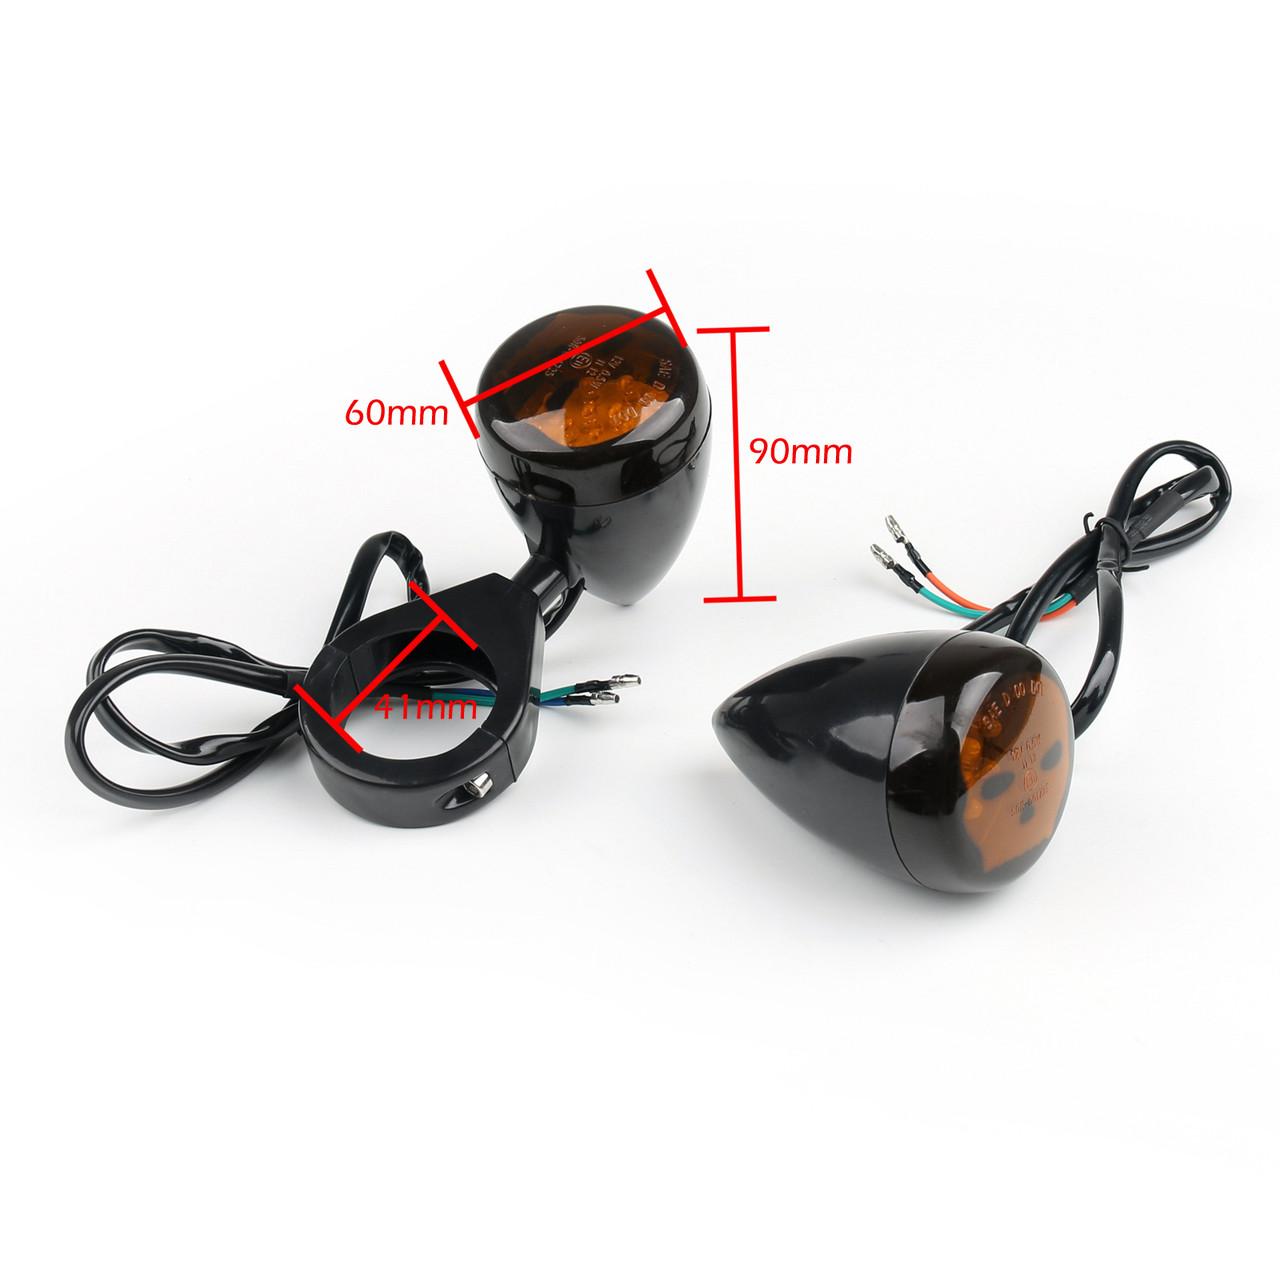 http://www.madhornets.store/AMZ/MotoPart/Turn%20Signals/TS-027/TS-027-Black-3.jpg